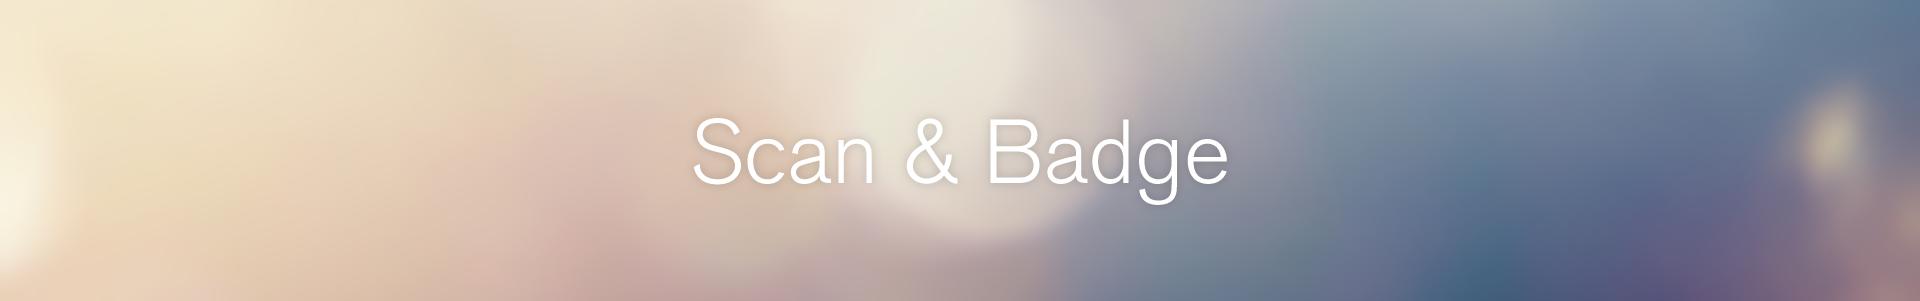 Scan & badge 2021  (english)